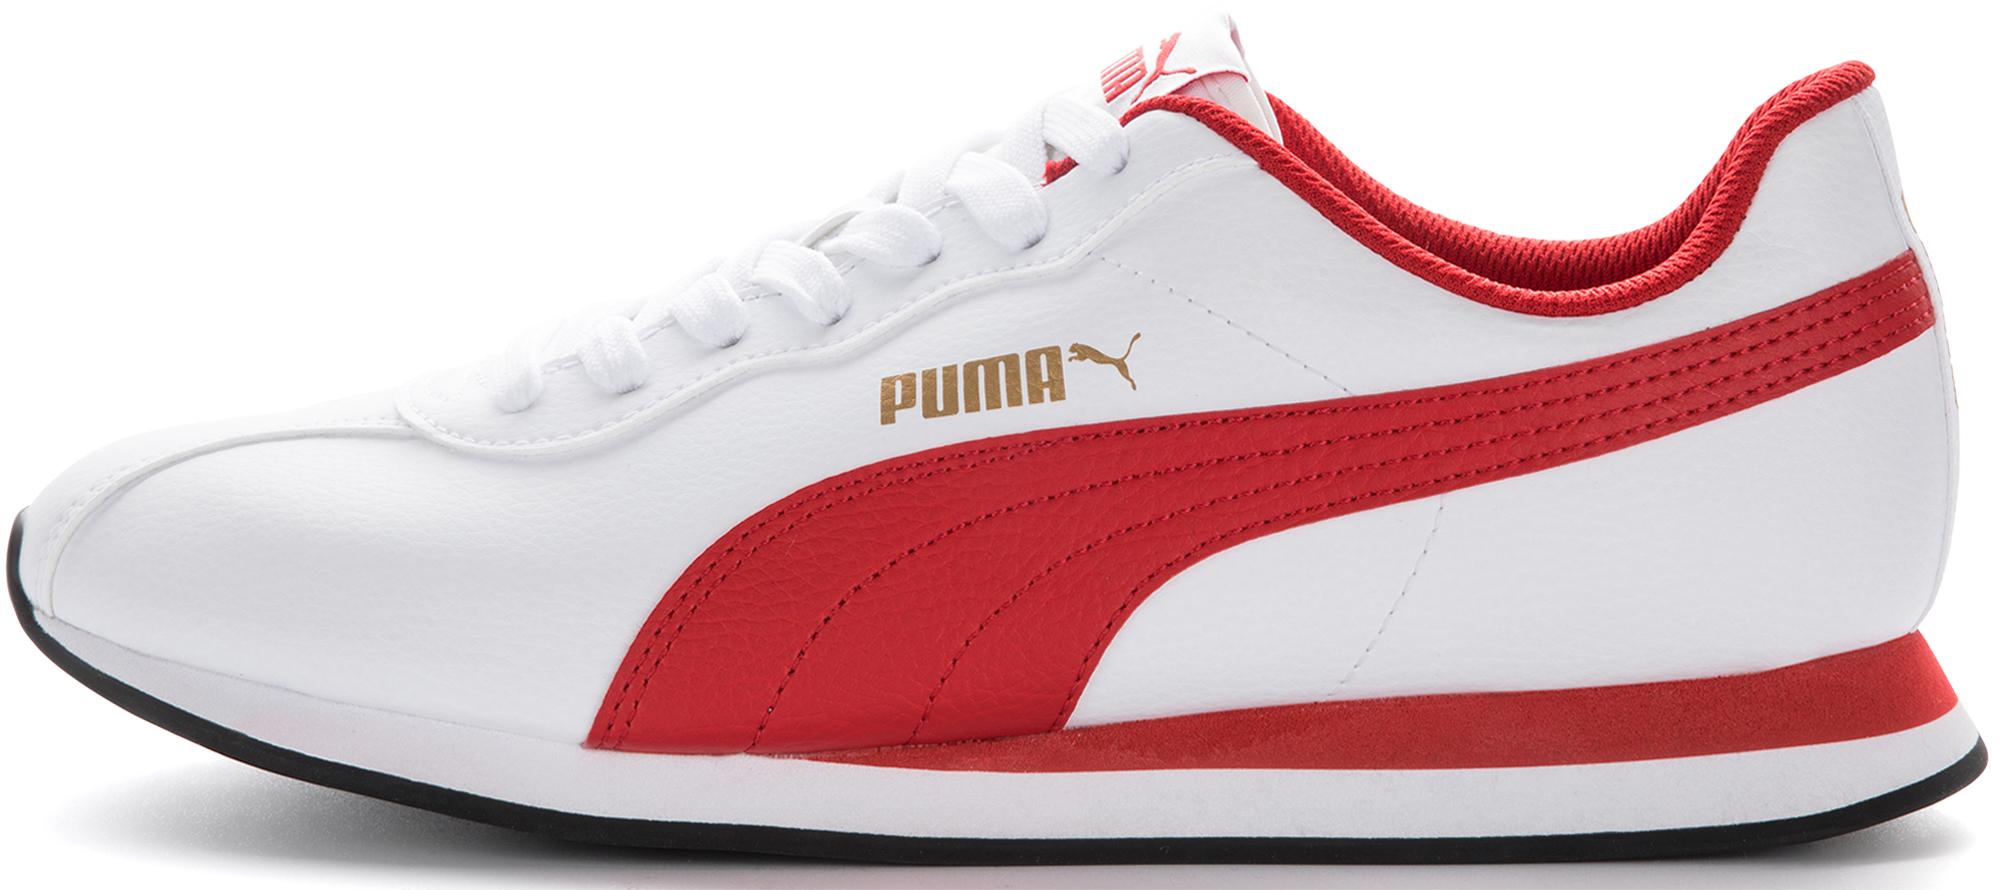 Puma Кроссовки мужские Puma Turin II, размер 40